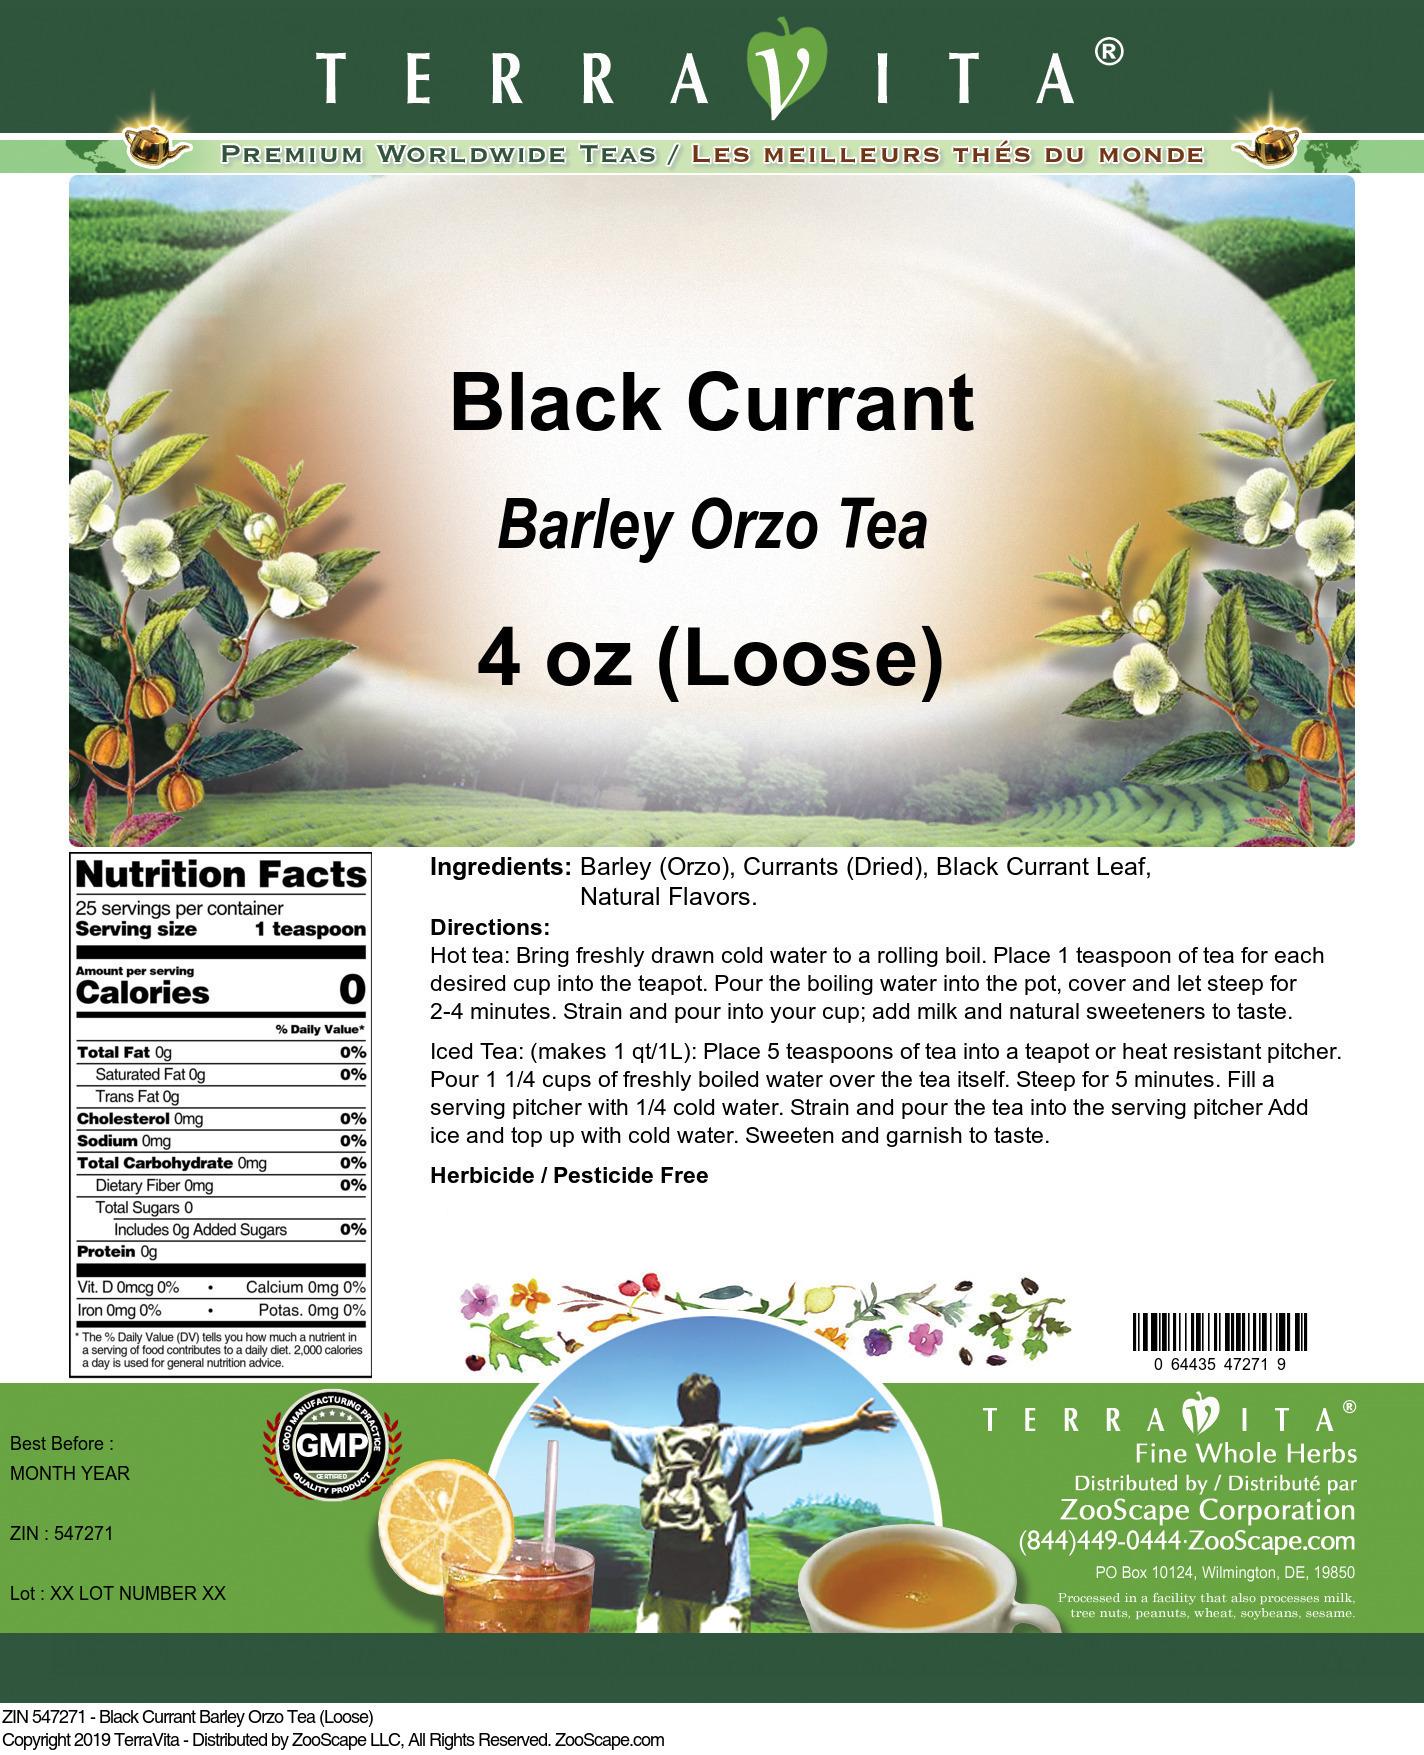 Black Currant Barley Orzo Tea (Loose)